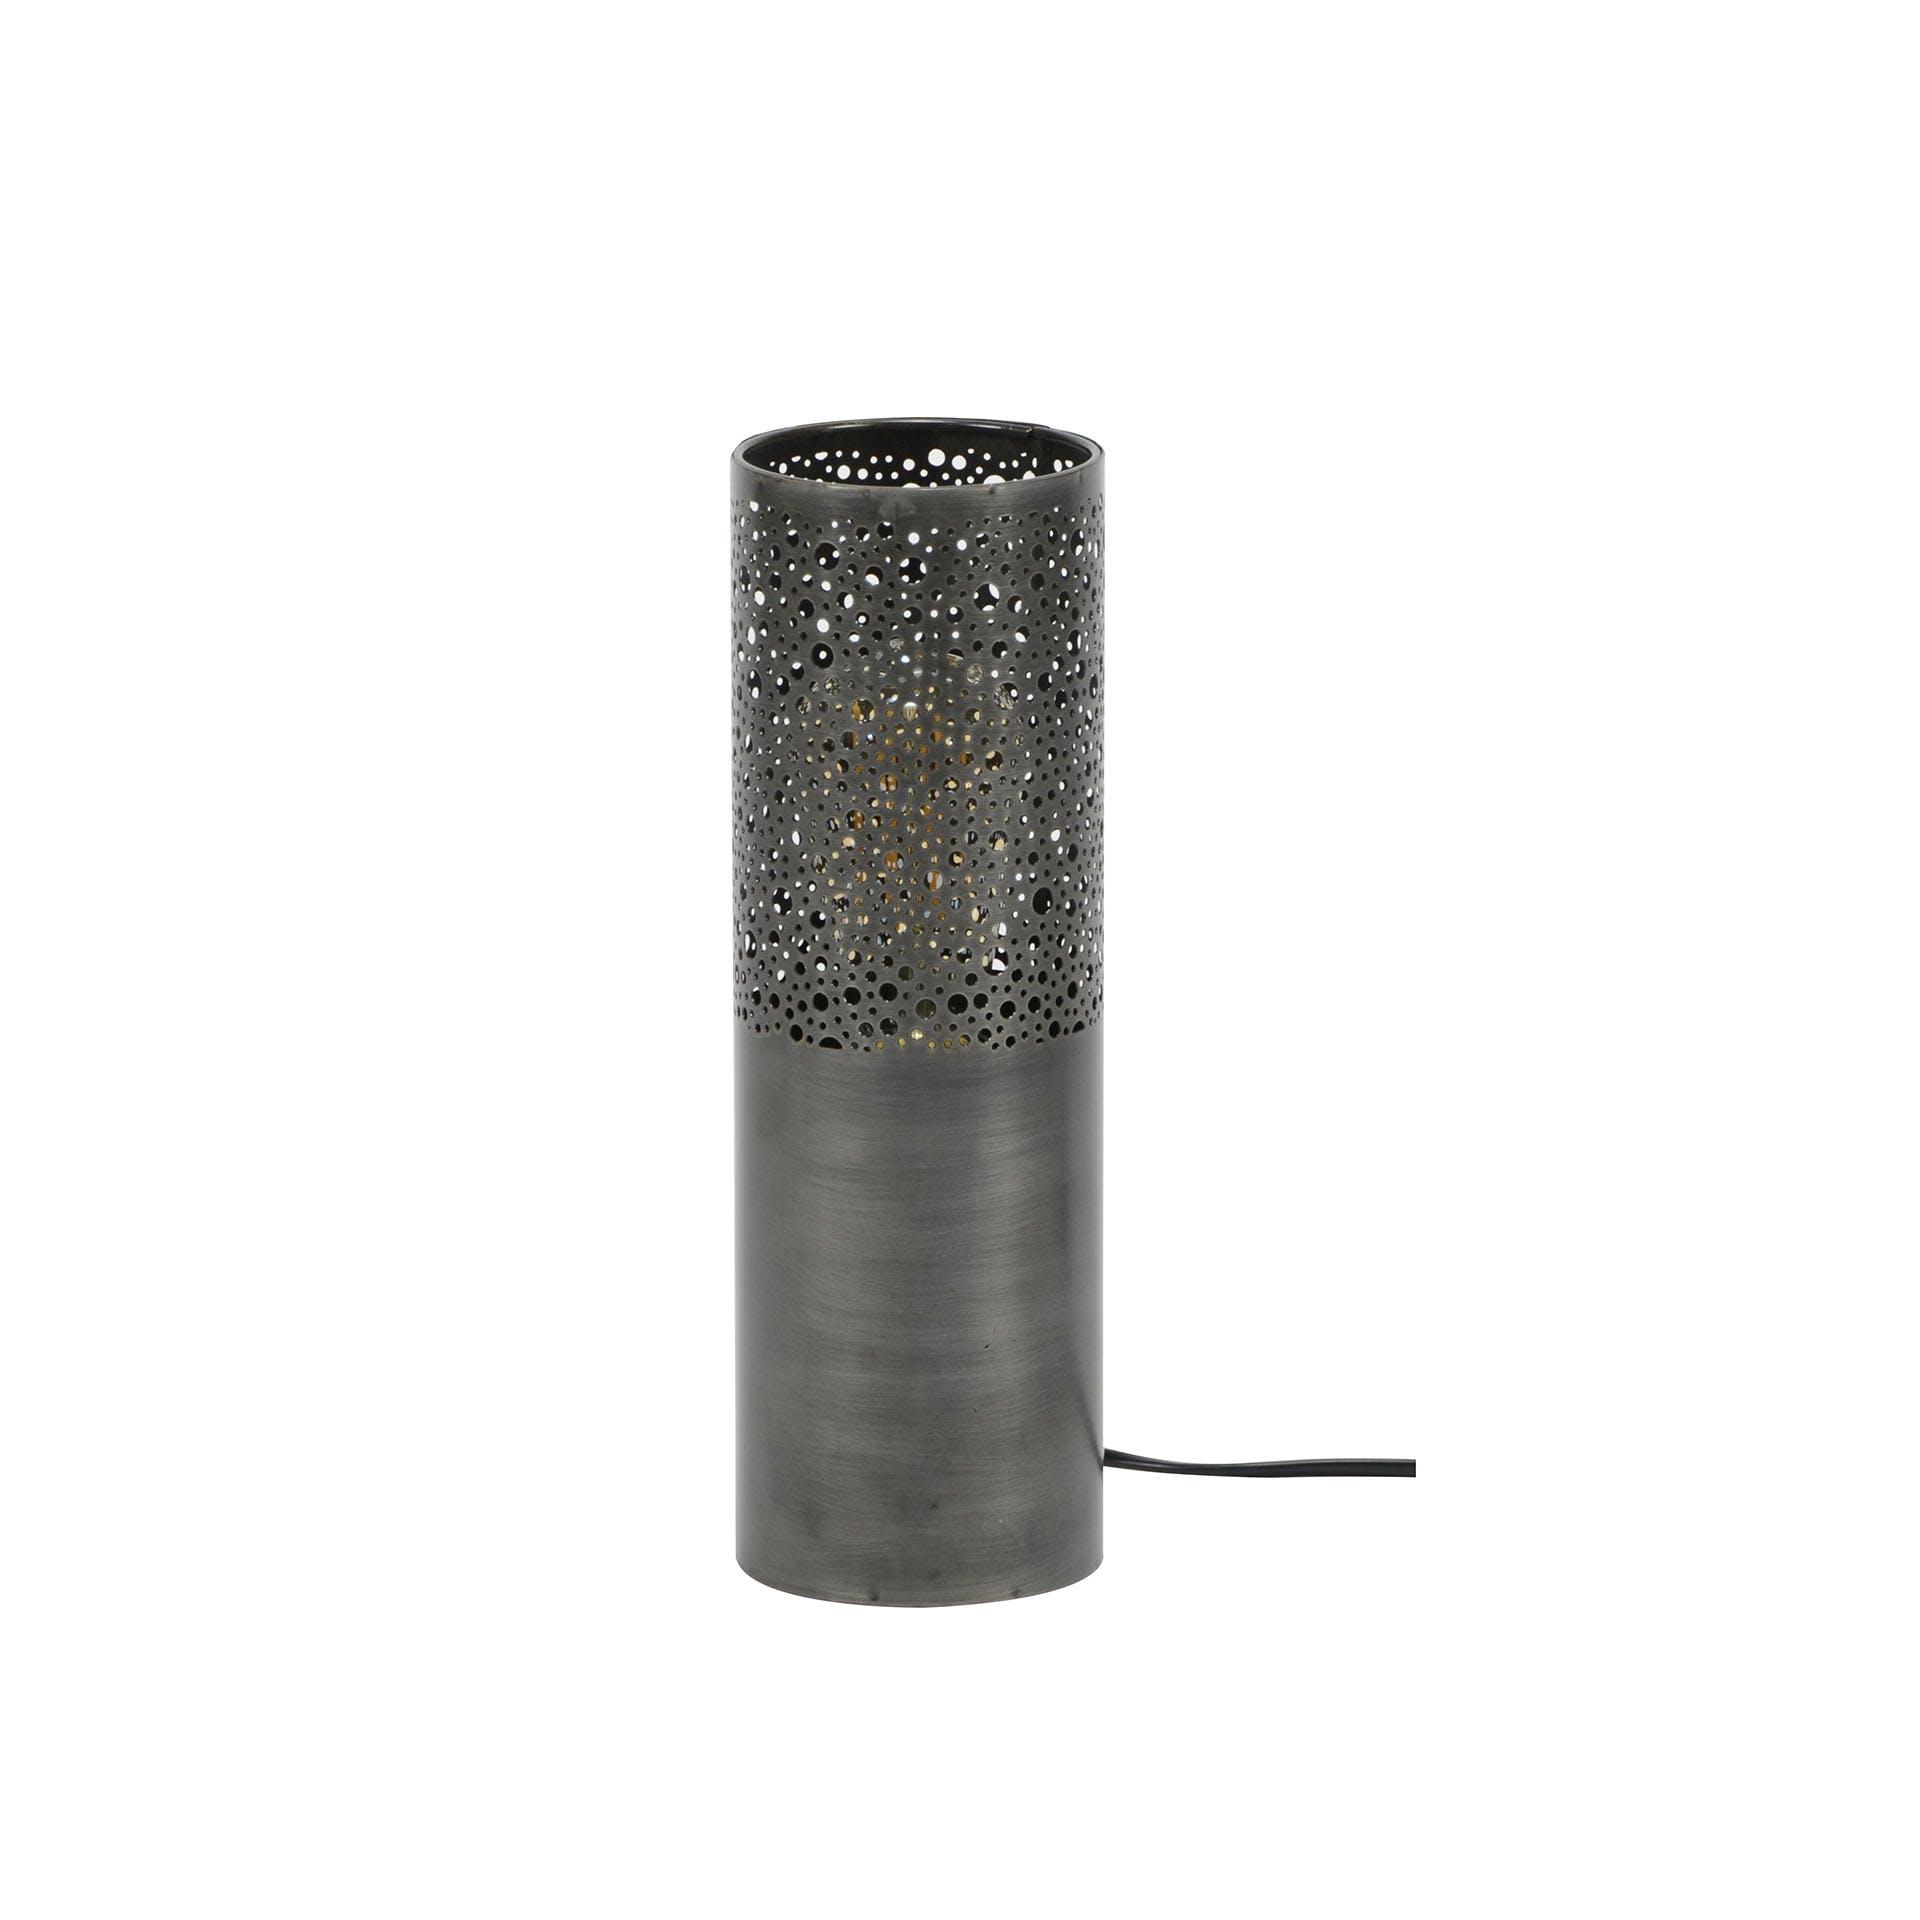 Lampe marocaine cylindre métal vieilli H30 cm RALF